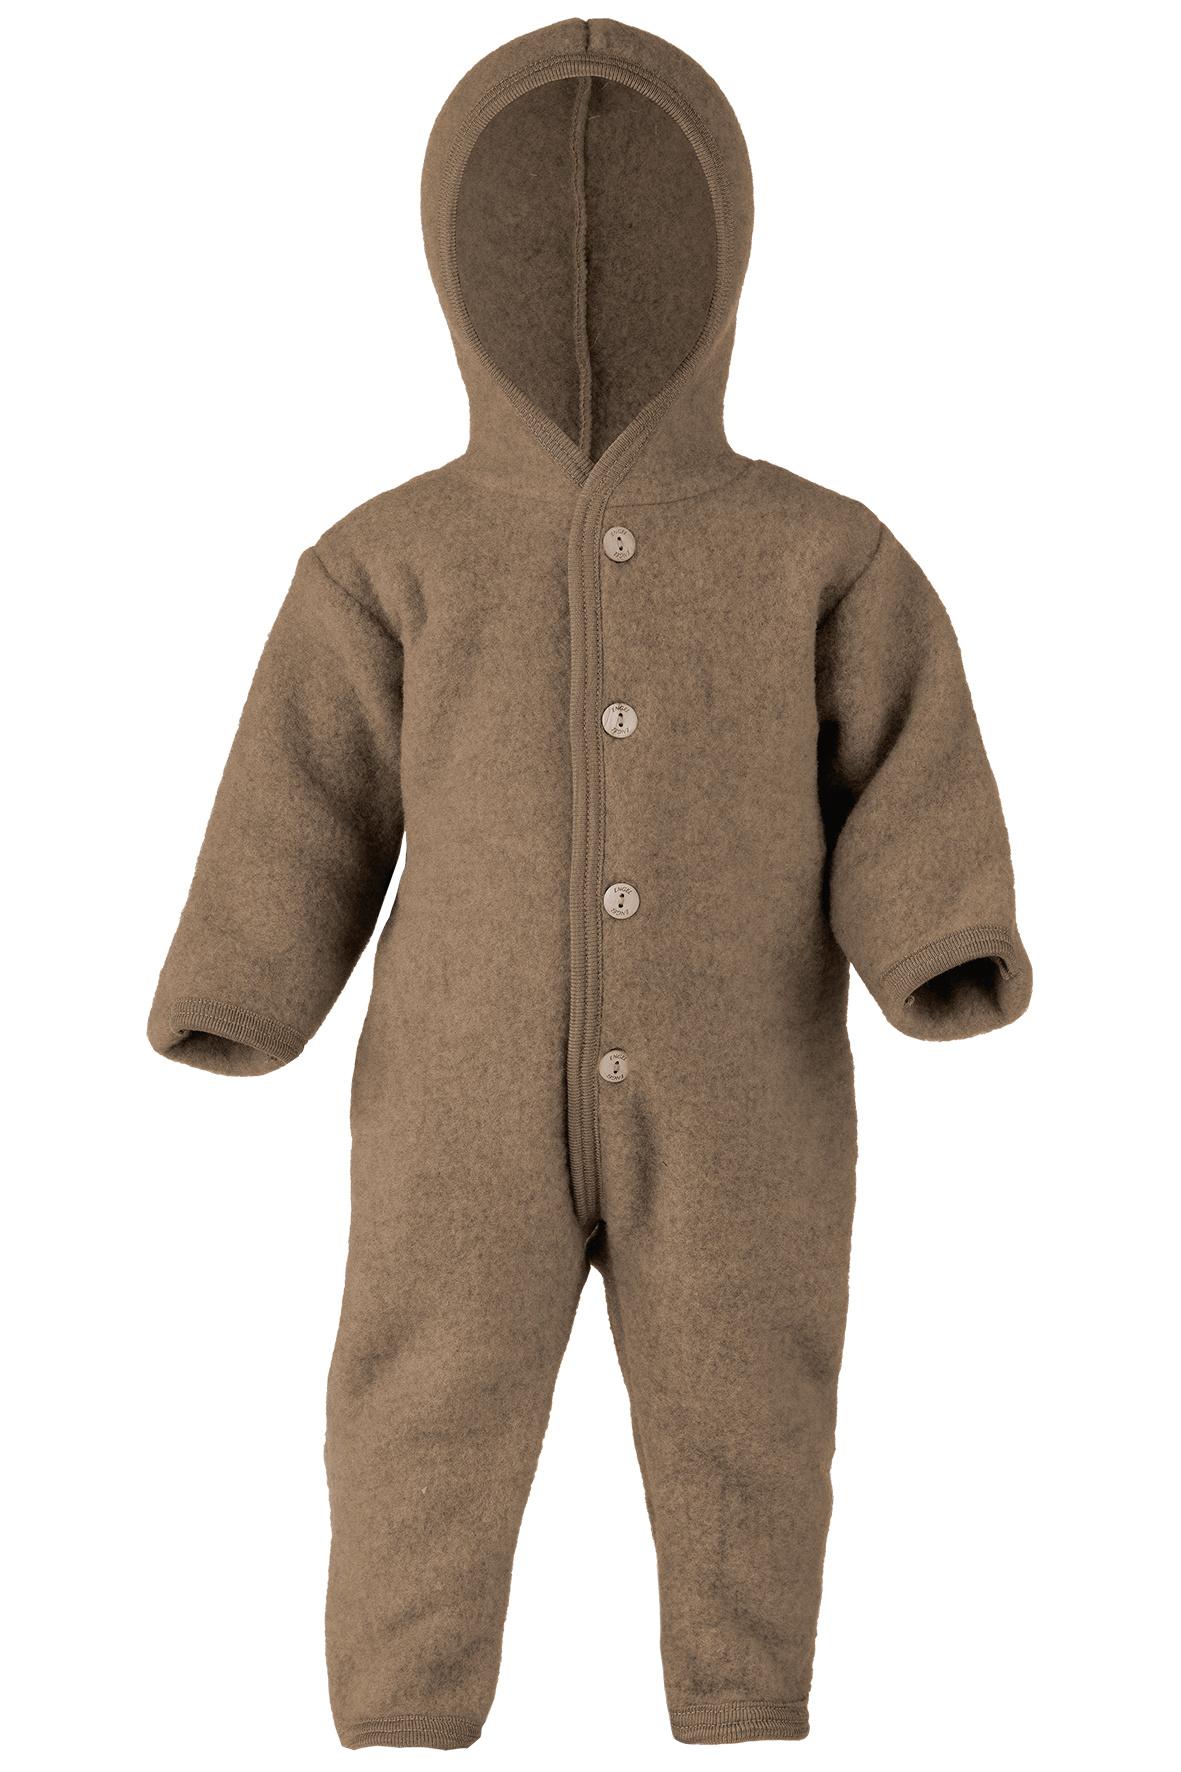 Hooded overall - Walnut-1